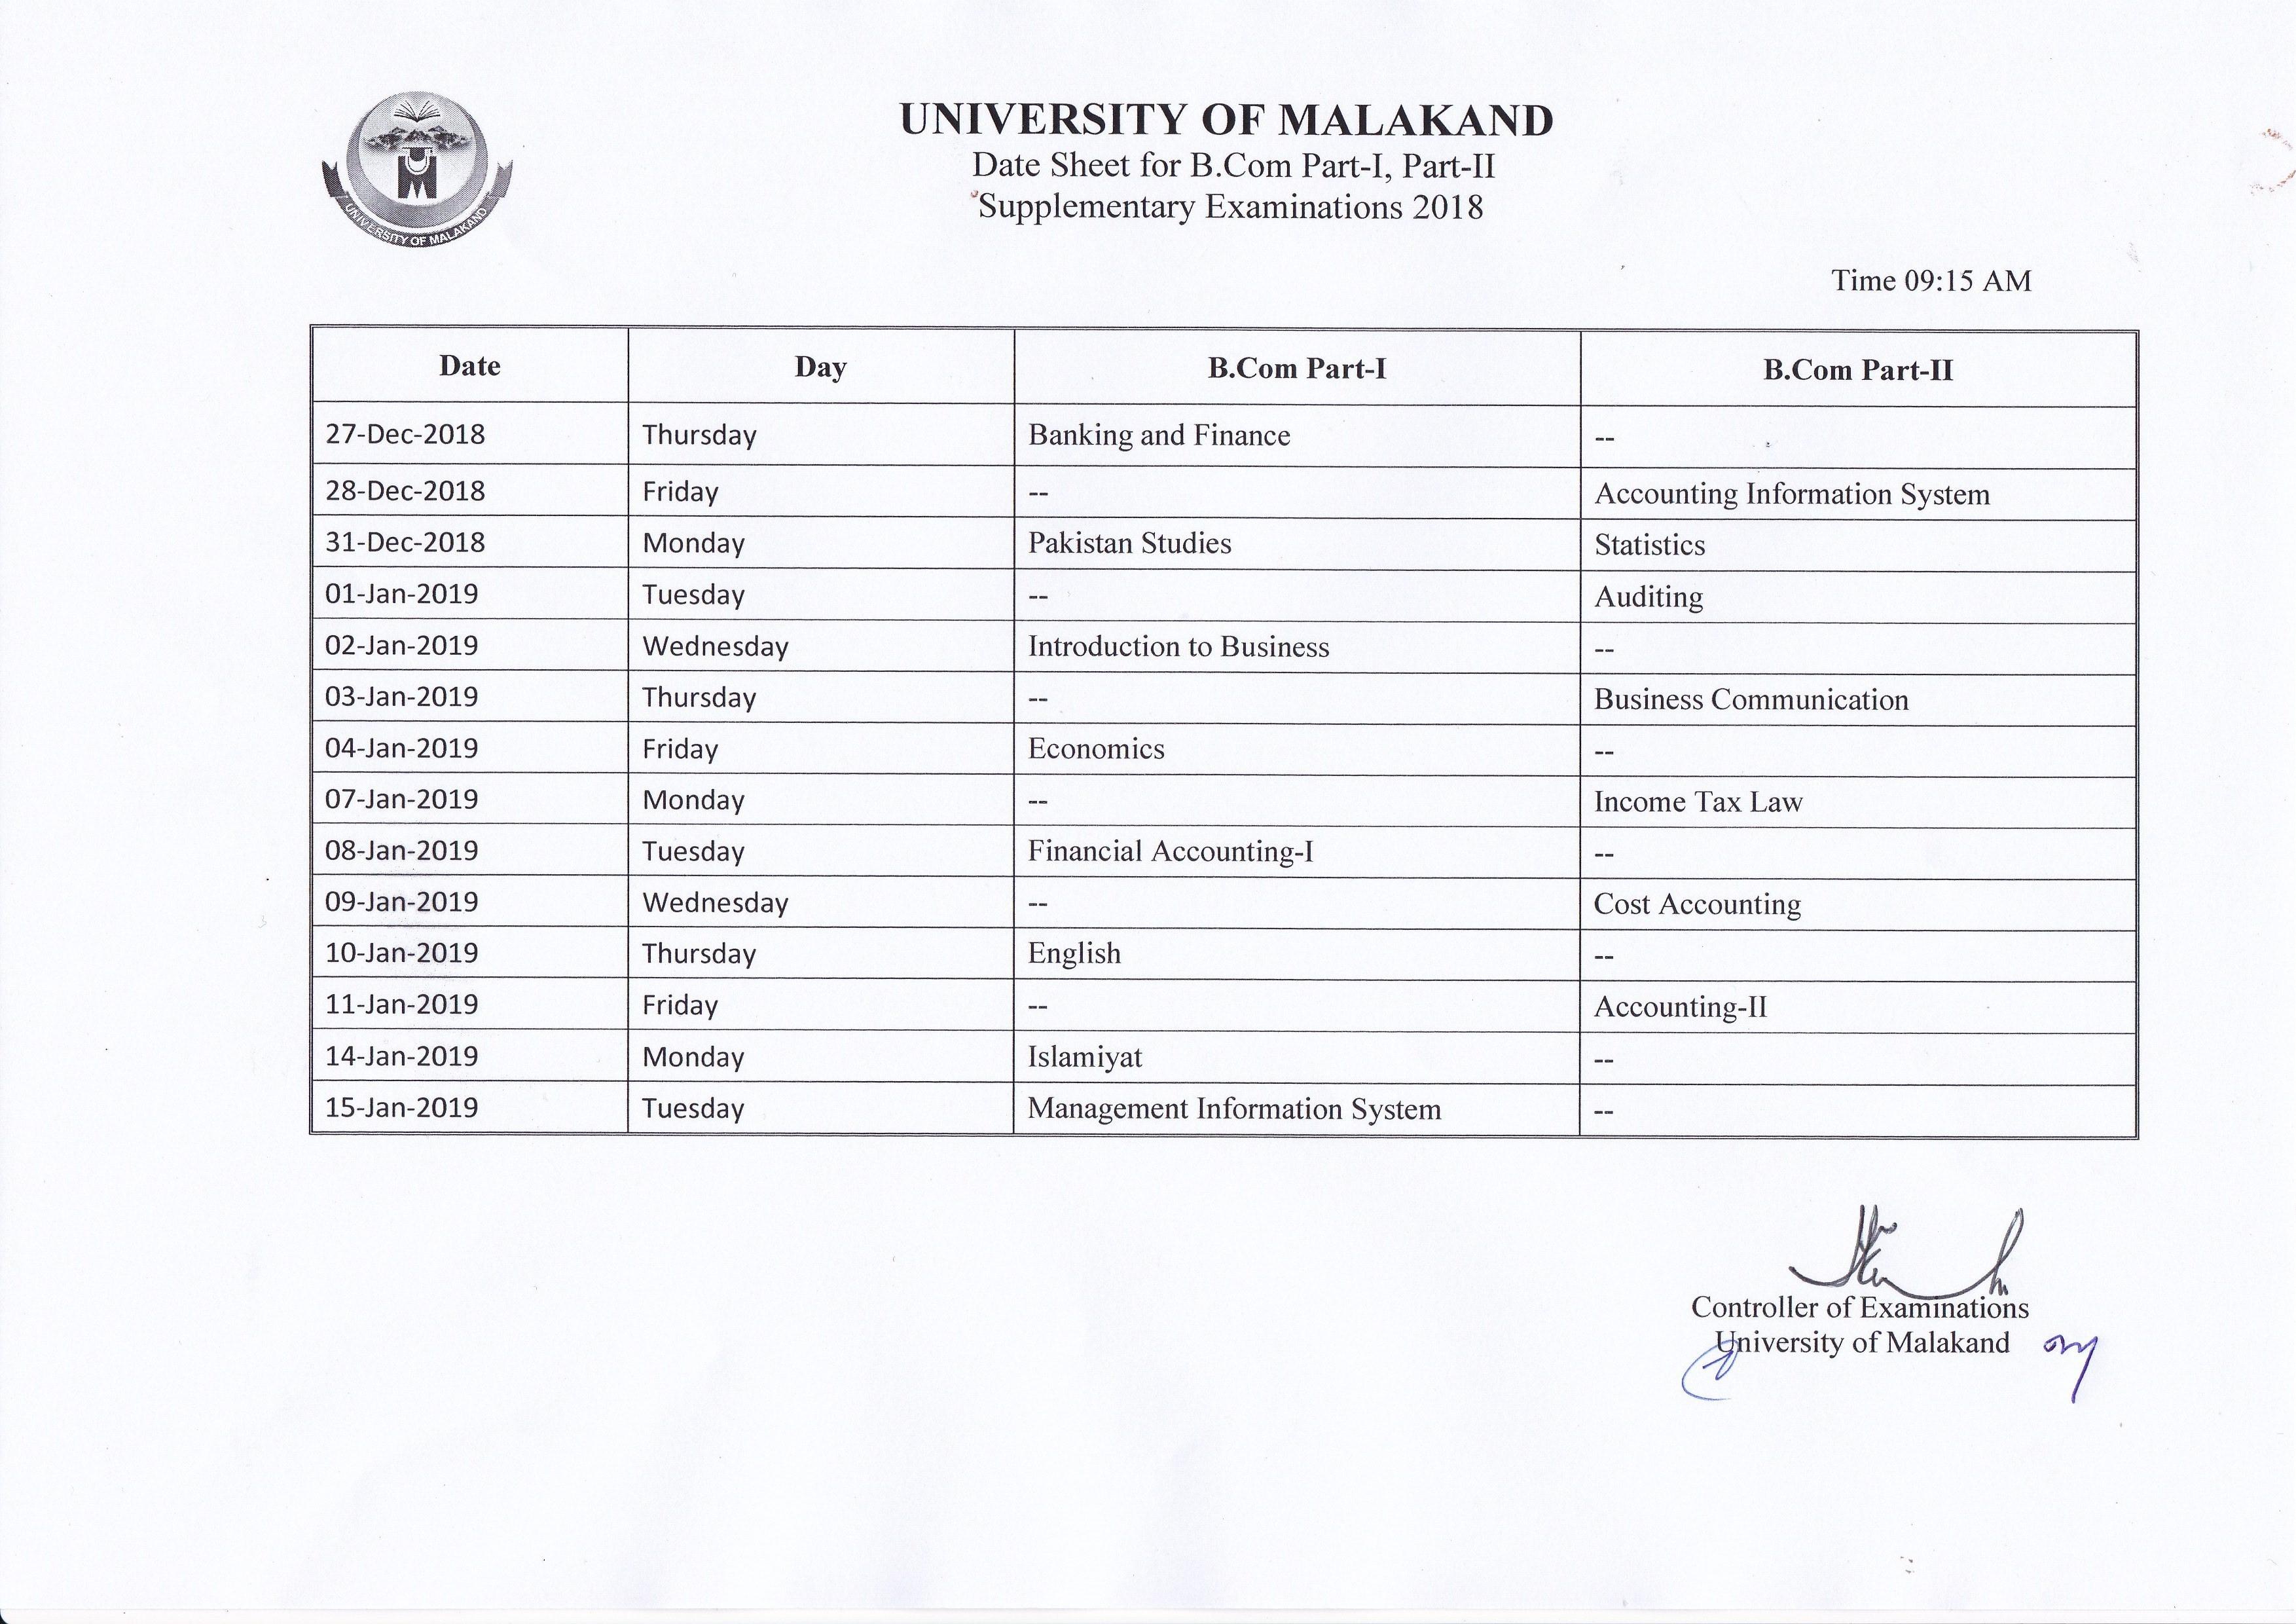 Date Sheet of B Supplementary Examination 2018